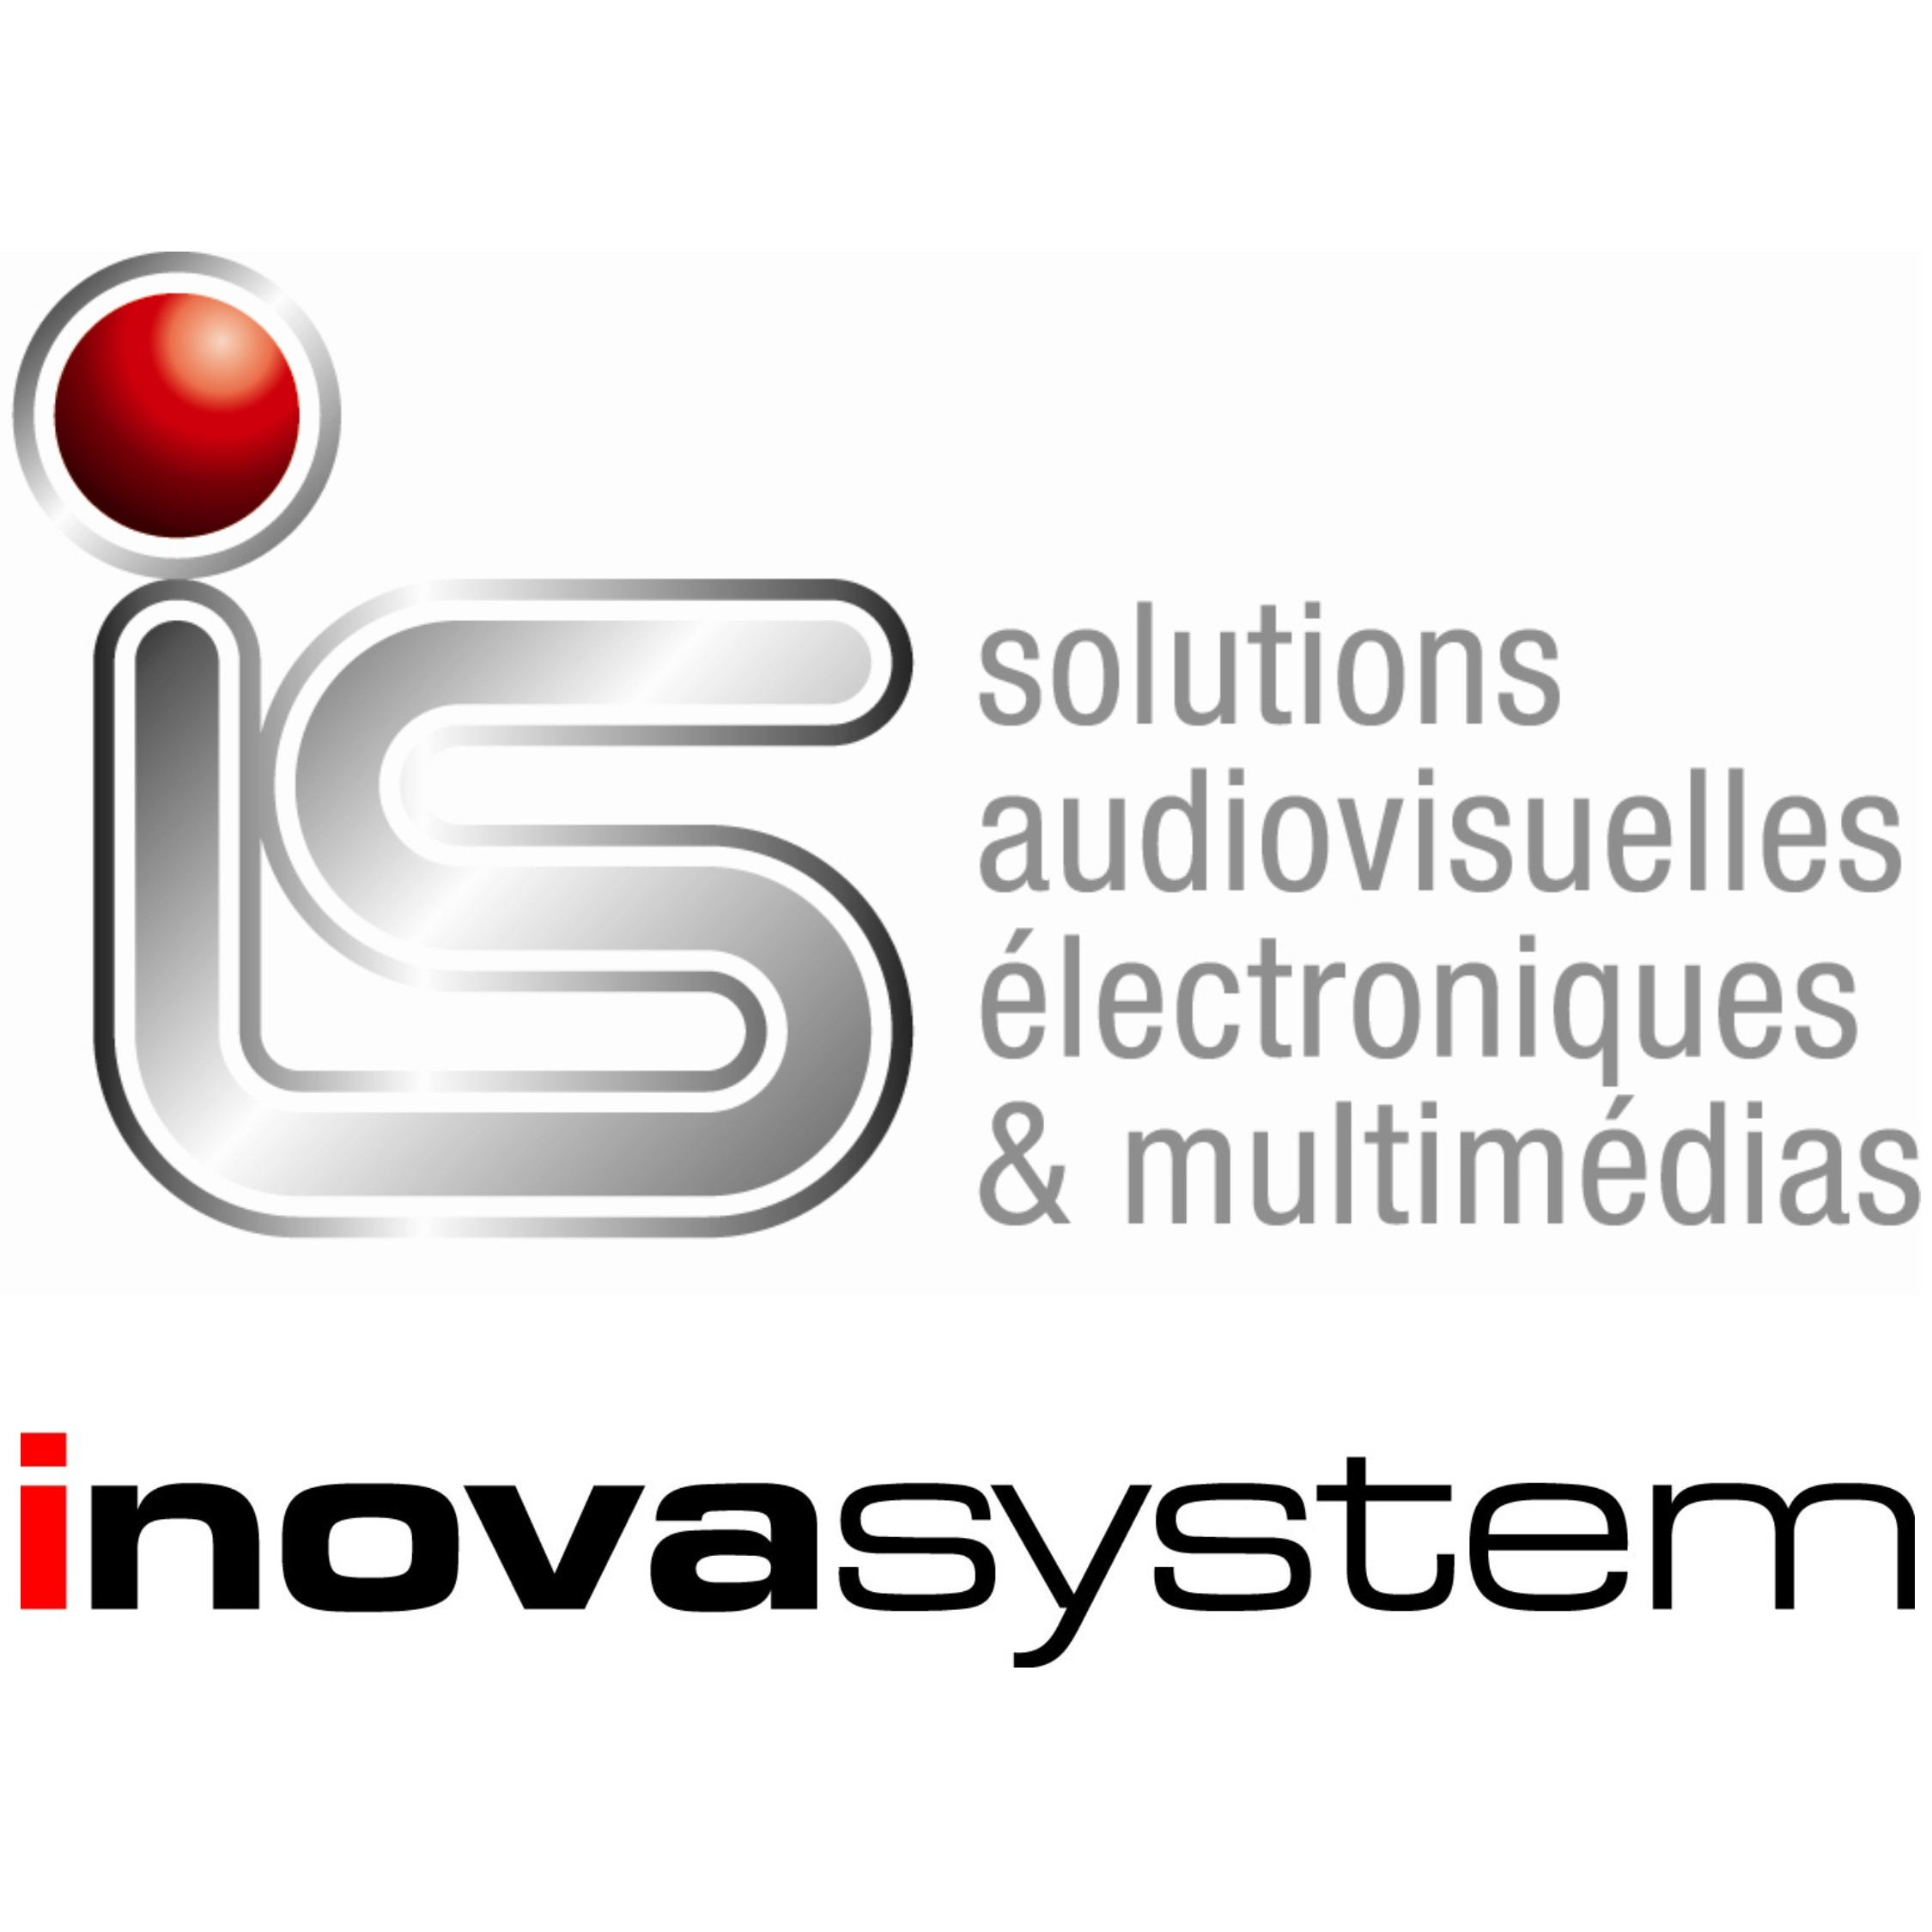 Inovasystem